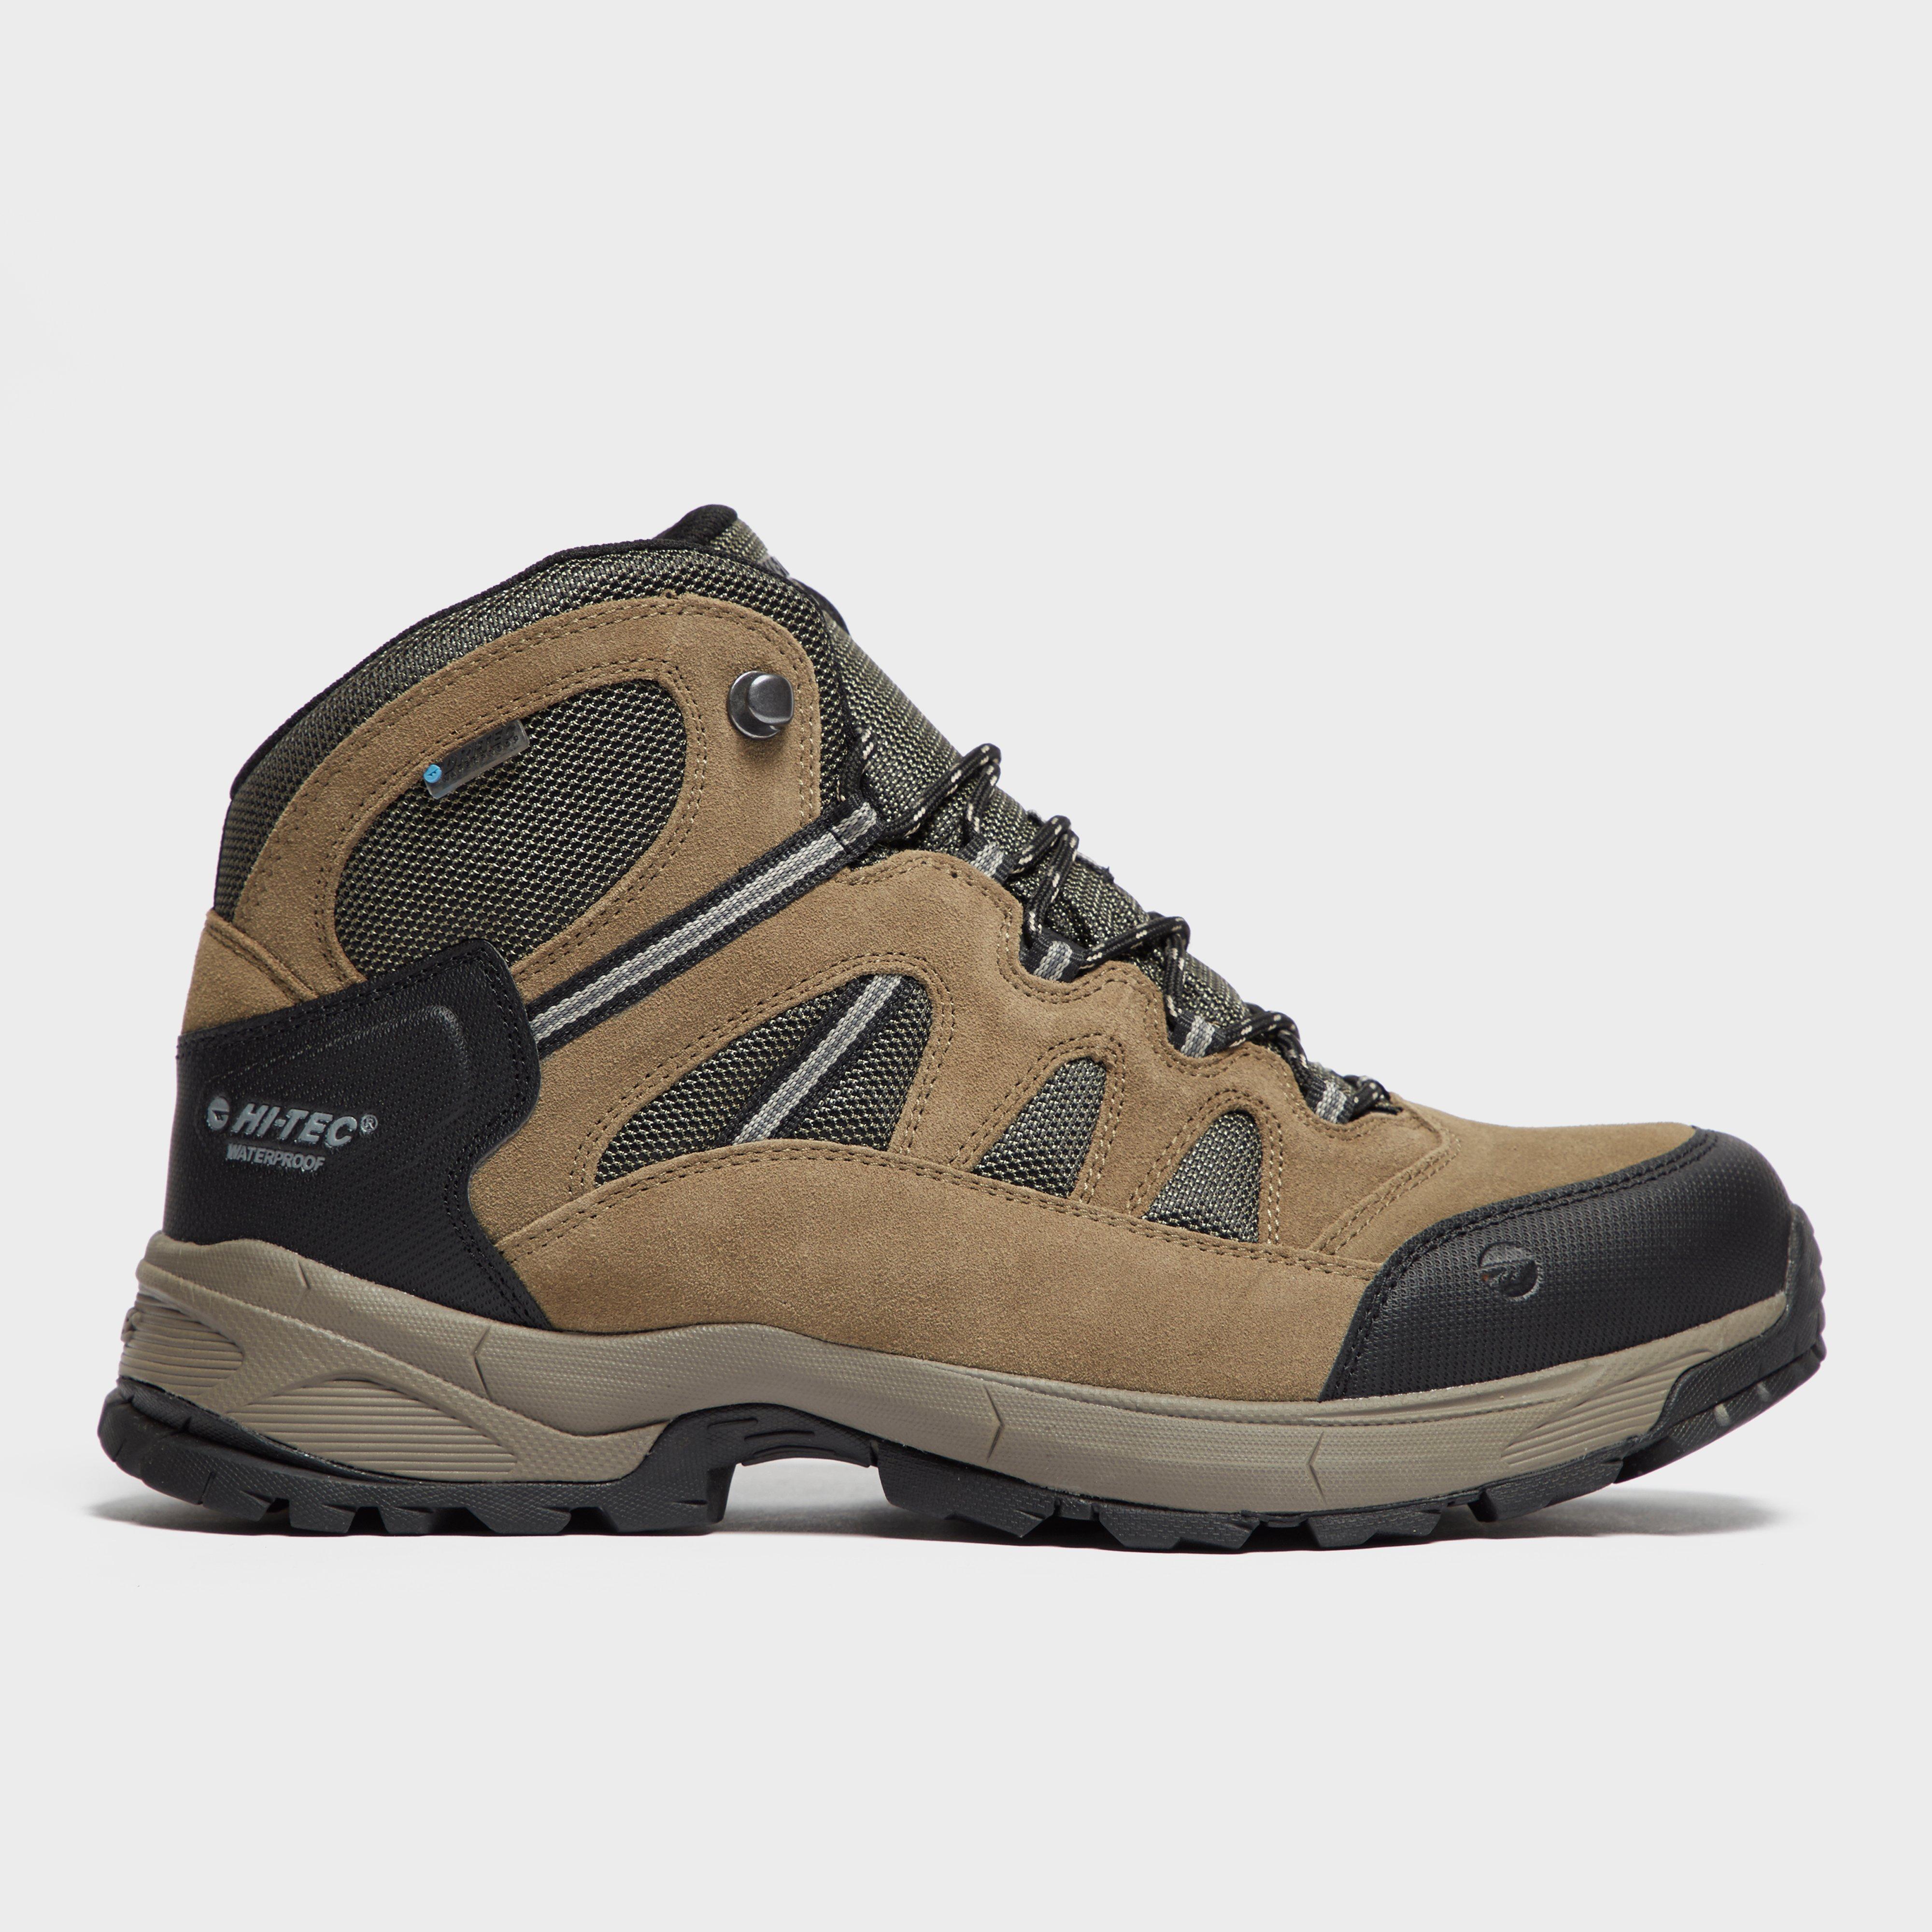 cfc6bb0175d Brown HI TEC Men s Mount Lennox Waterproof Boot image 1